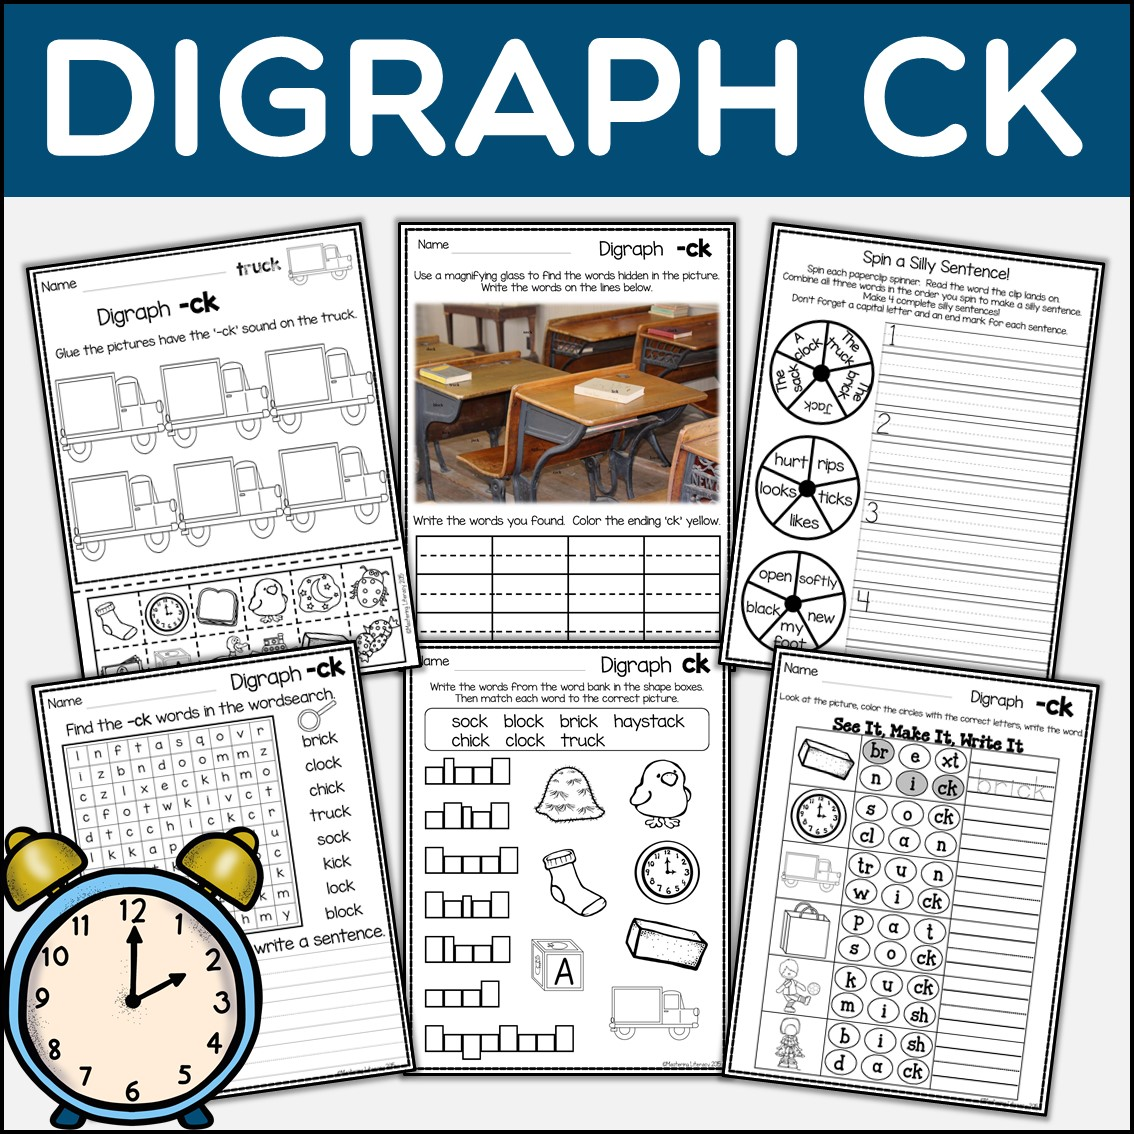 Phonics Phonics Digraph Ck